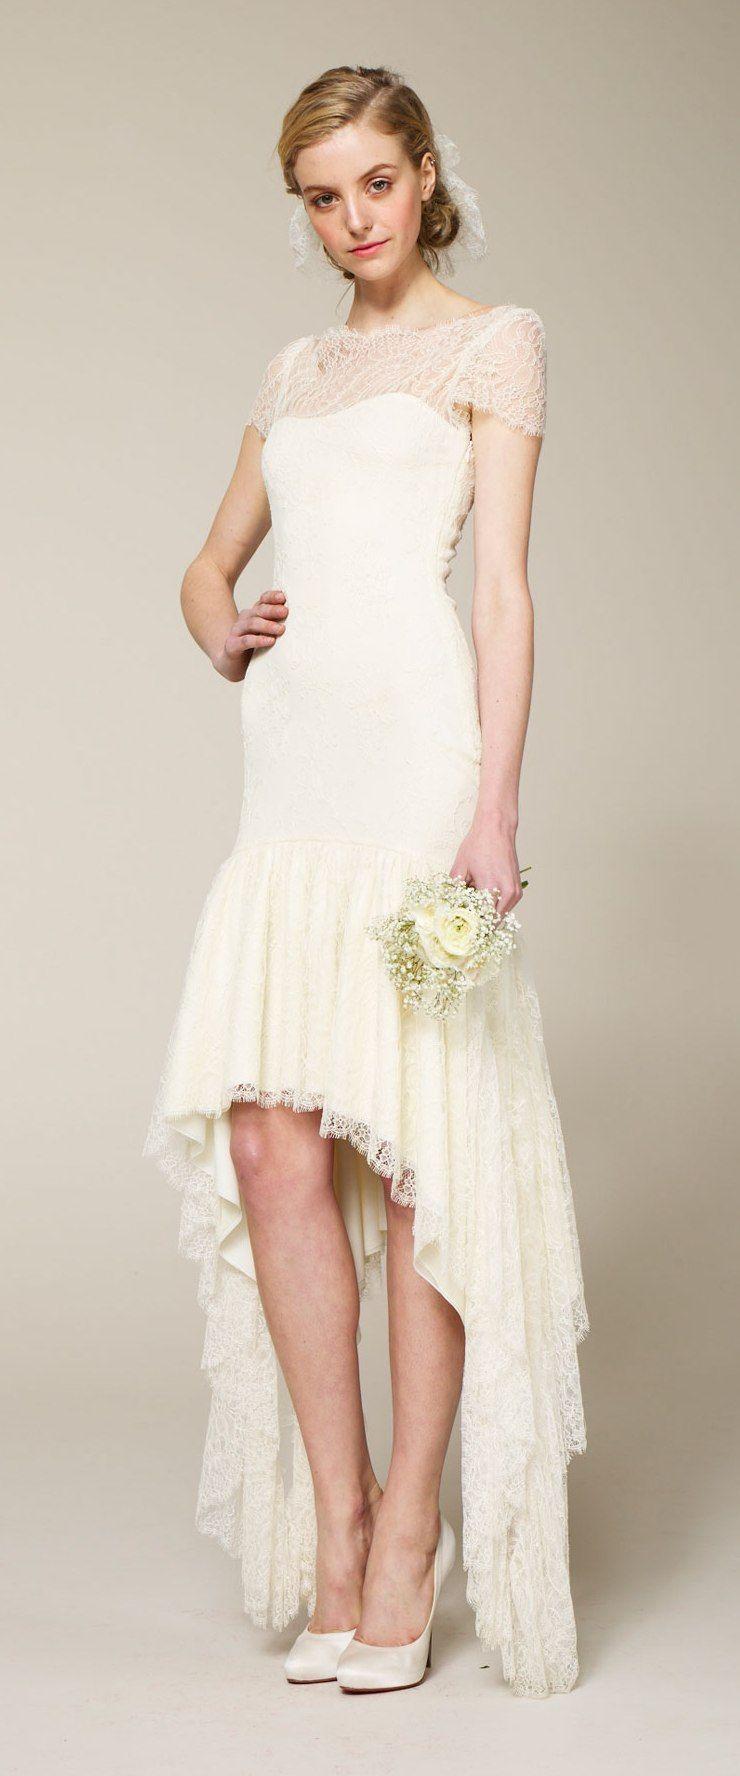 Marchesa diphem wedding dresses pinterest marchesa white